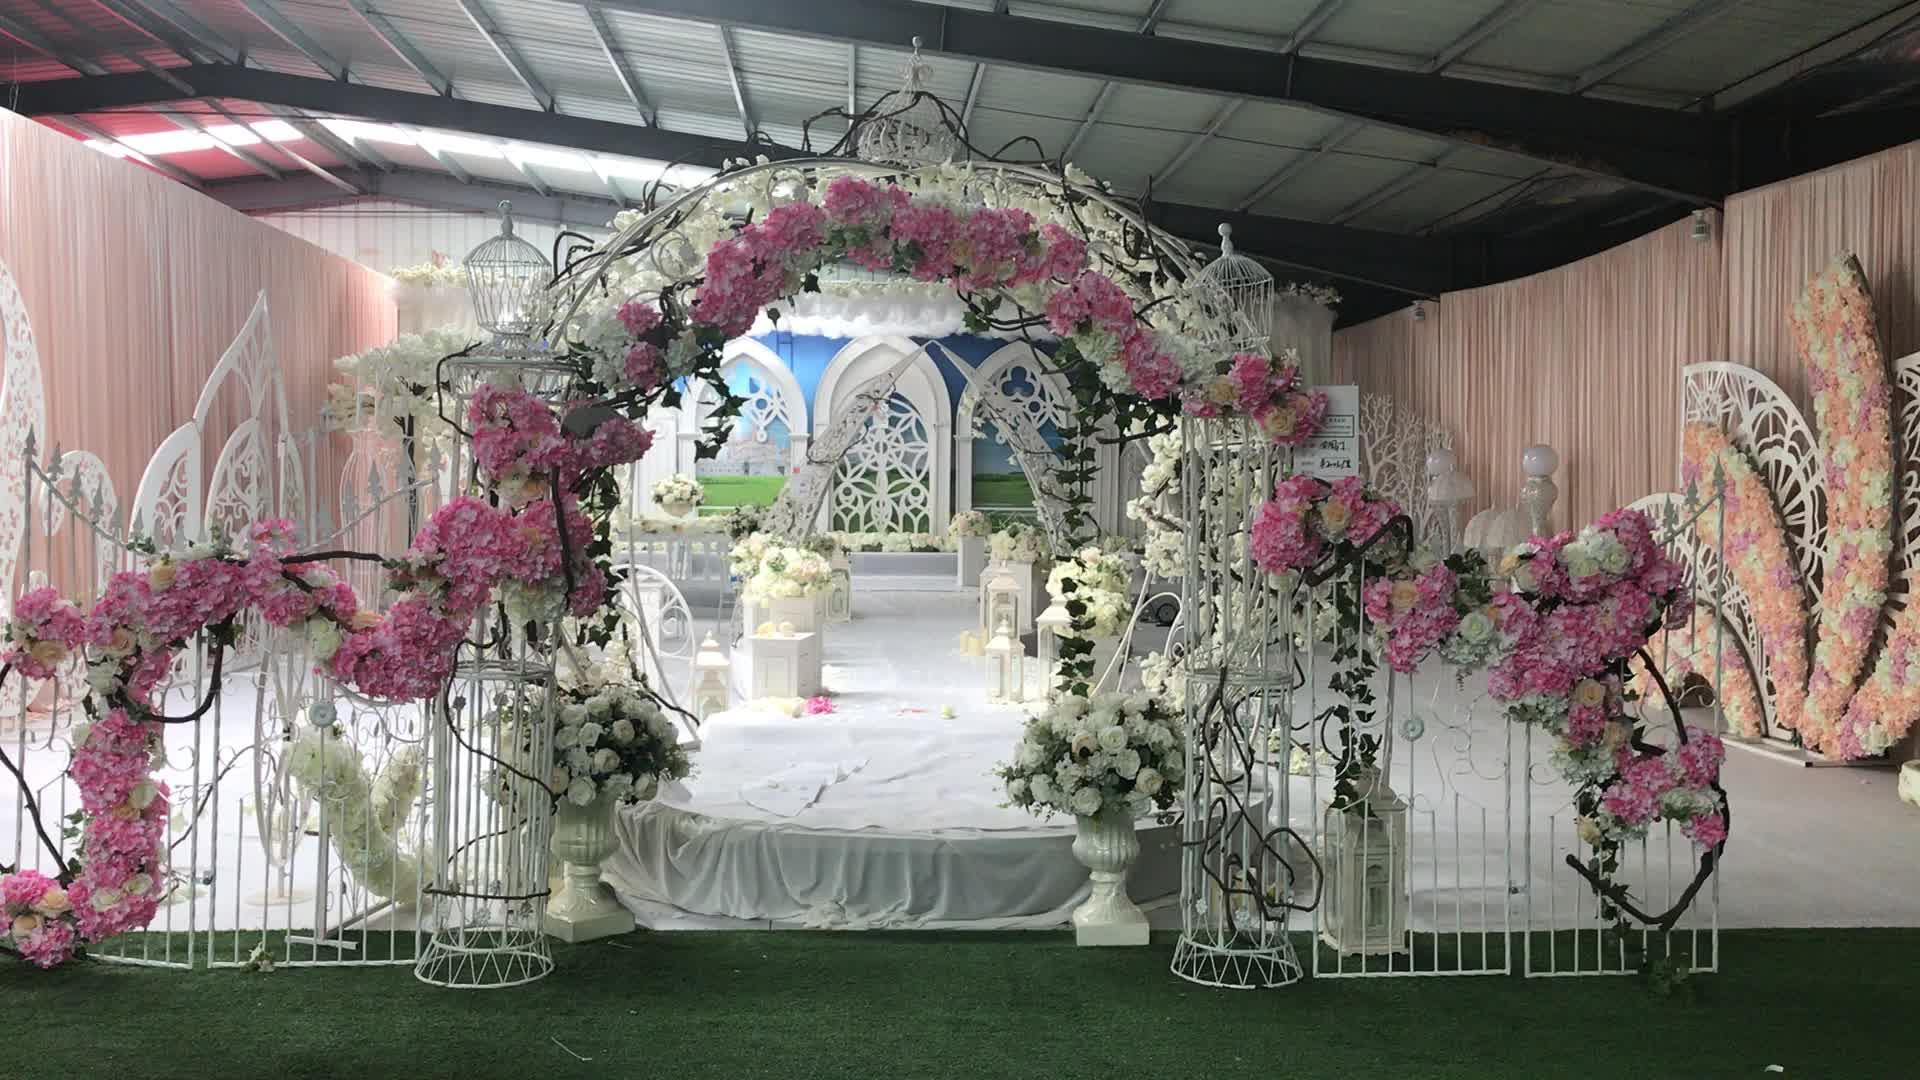 Moroccan Wedding Backdrop Frame Decoration Pedestal Arch